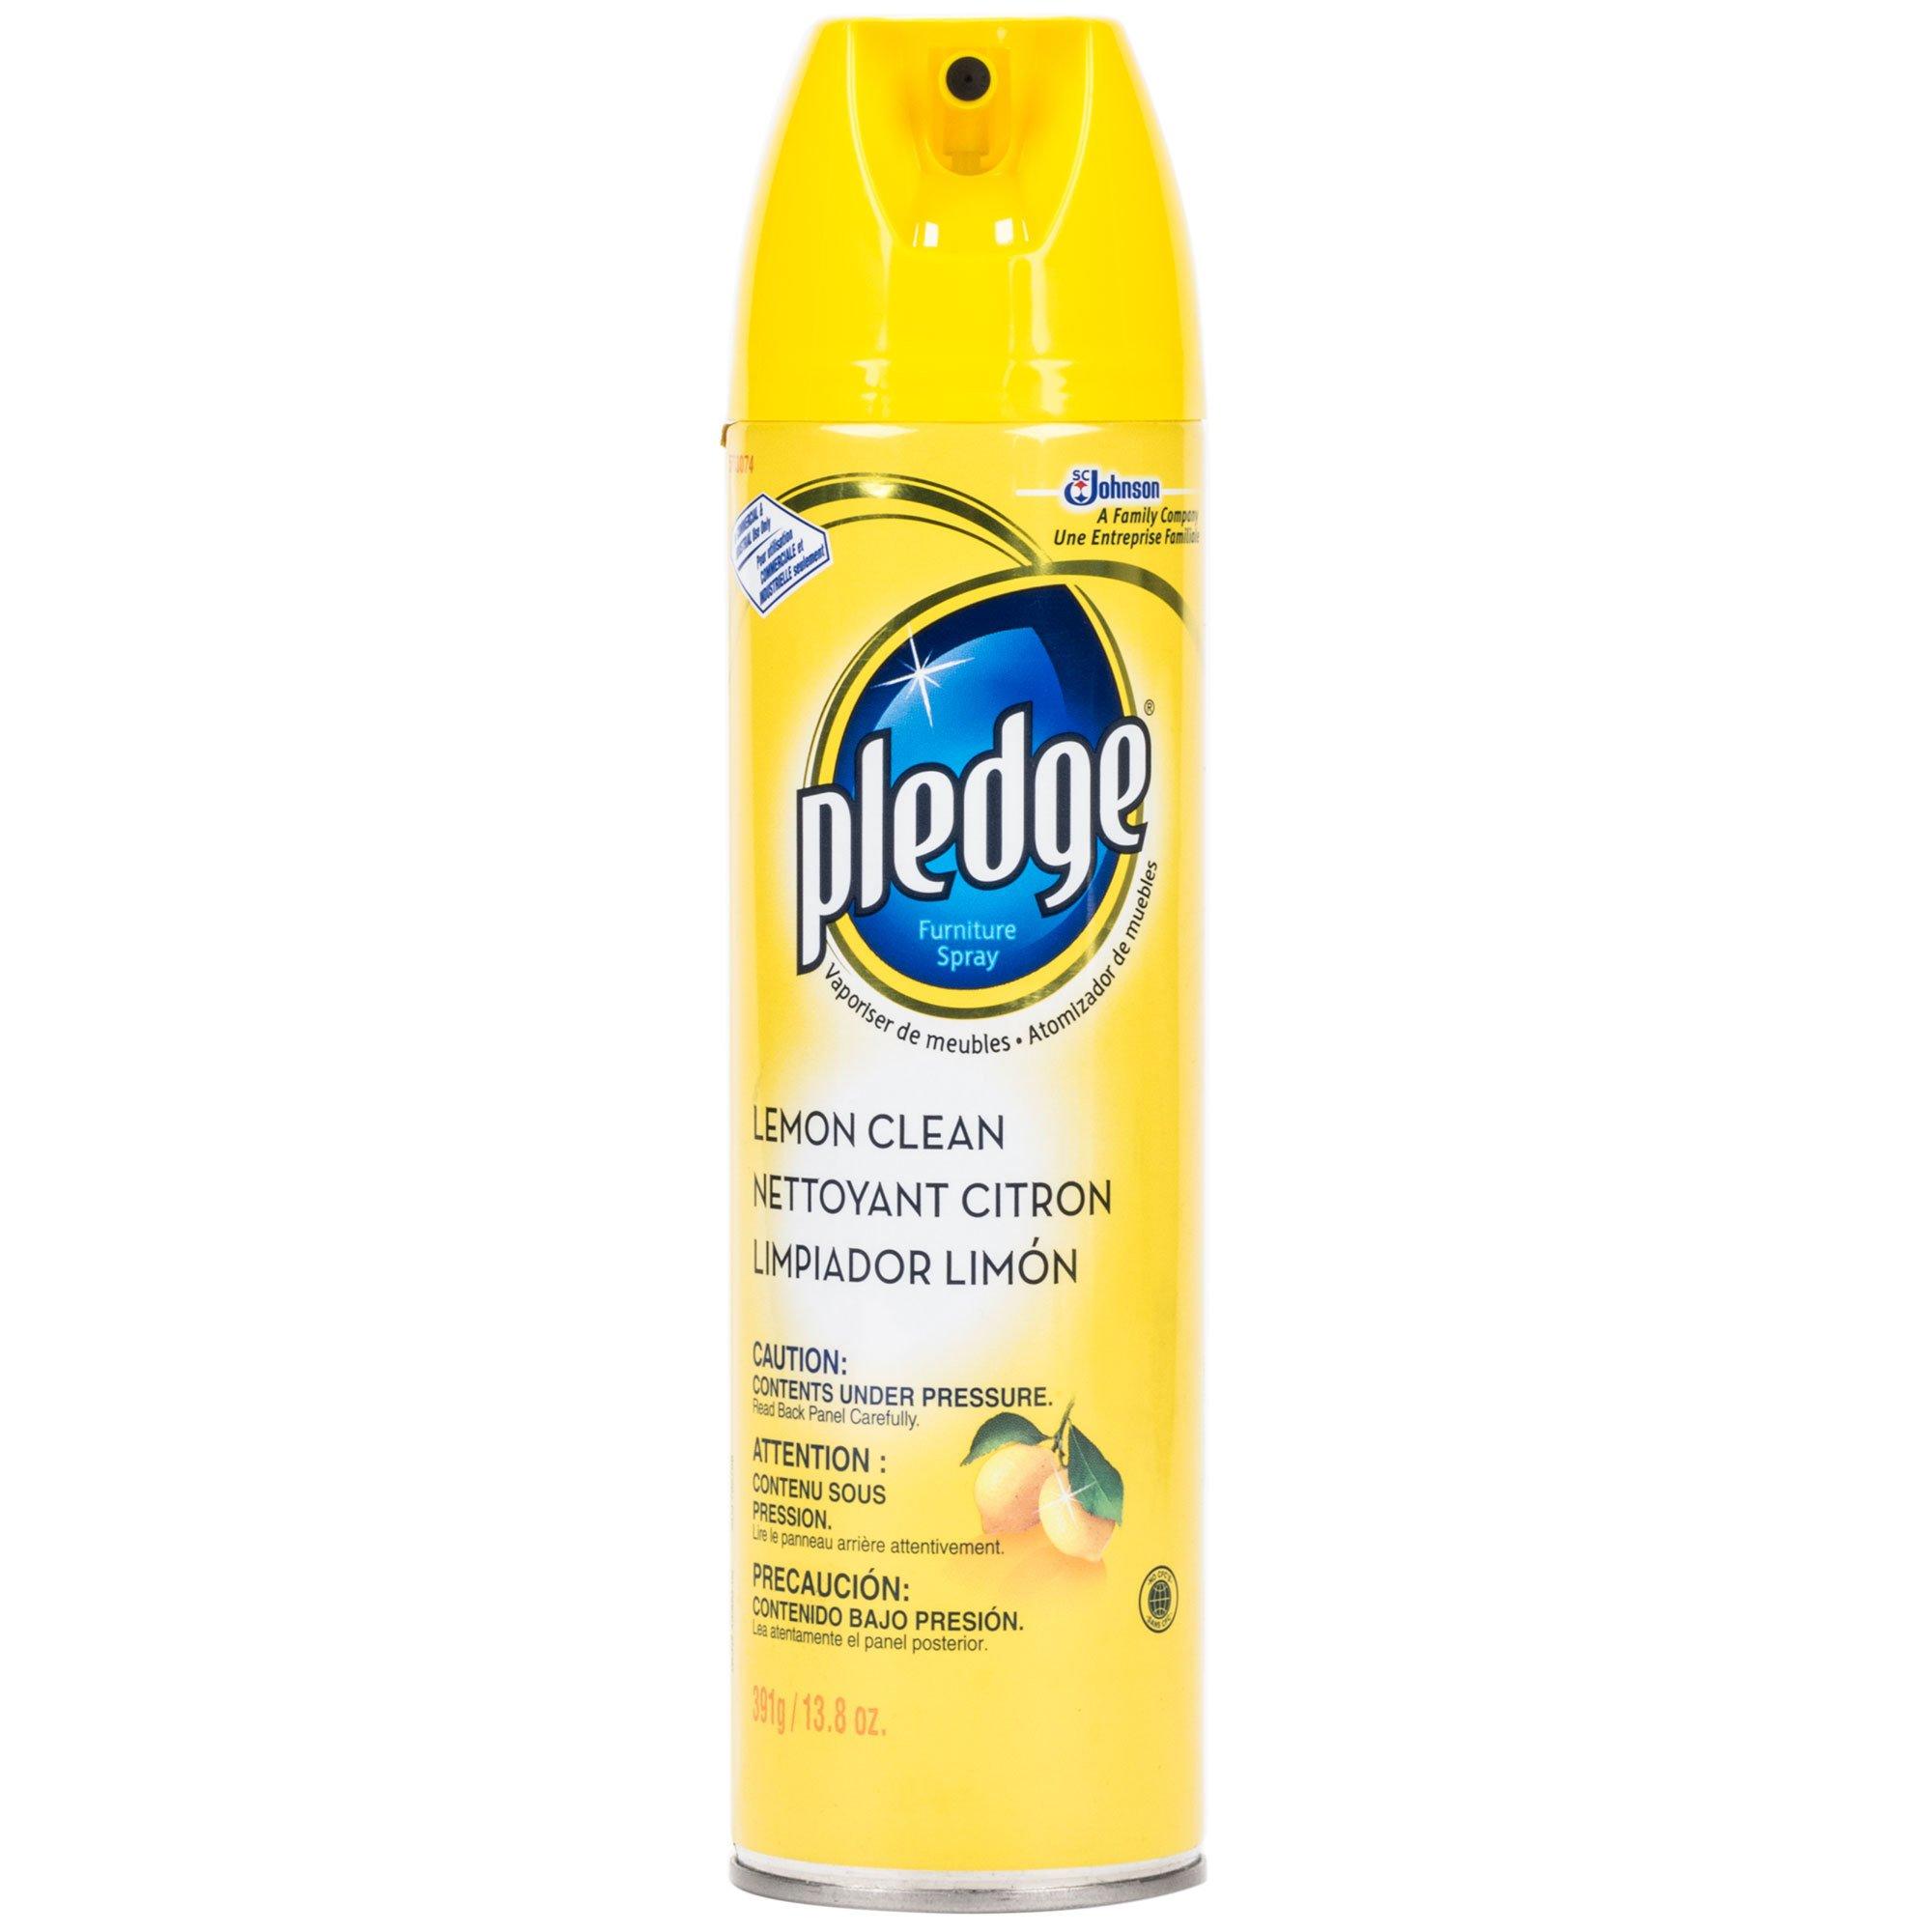 Pledge Furniture Spray (Lemon Clean, Aerosol, 13.8-Ounce, Case of 6) by Pledge